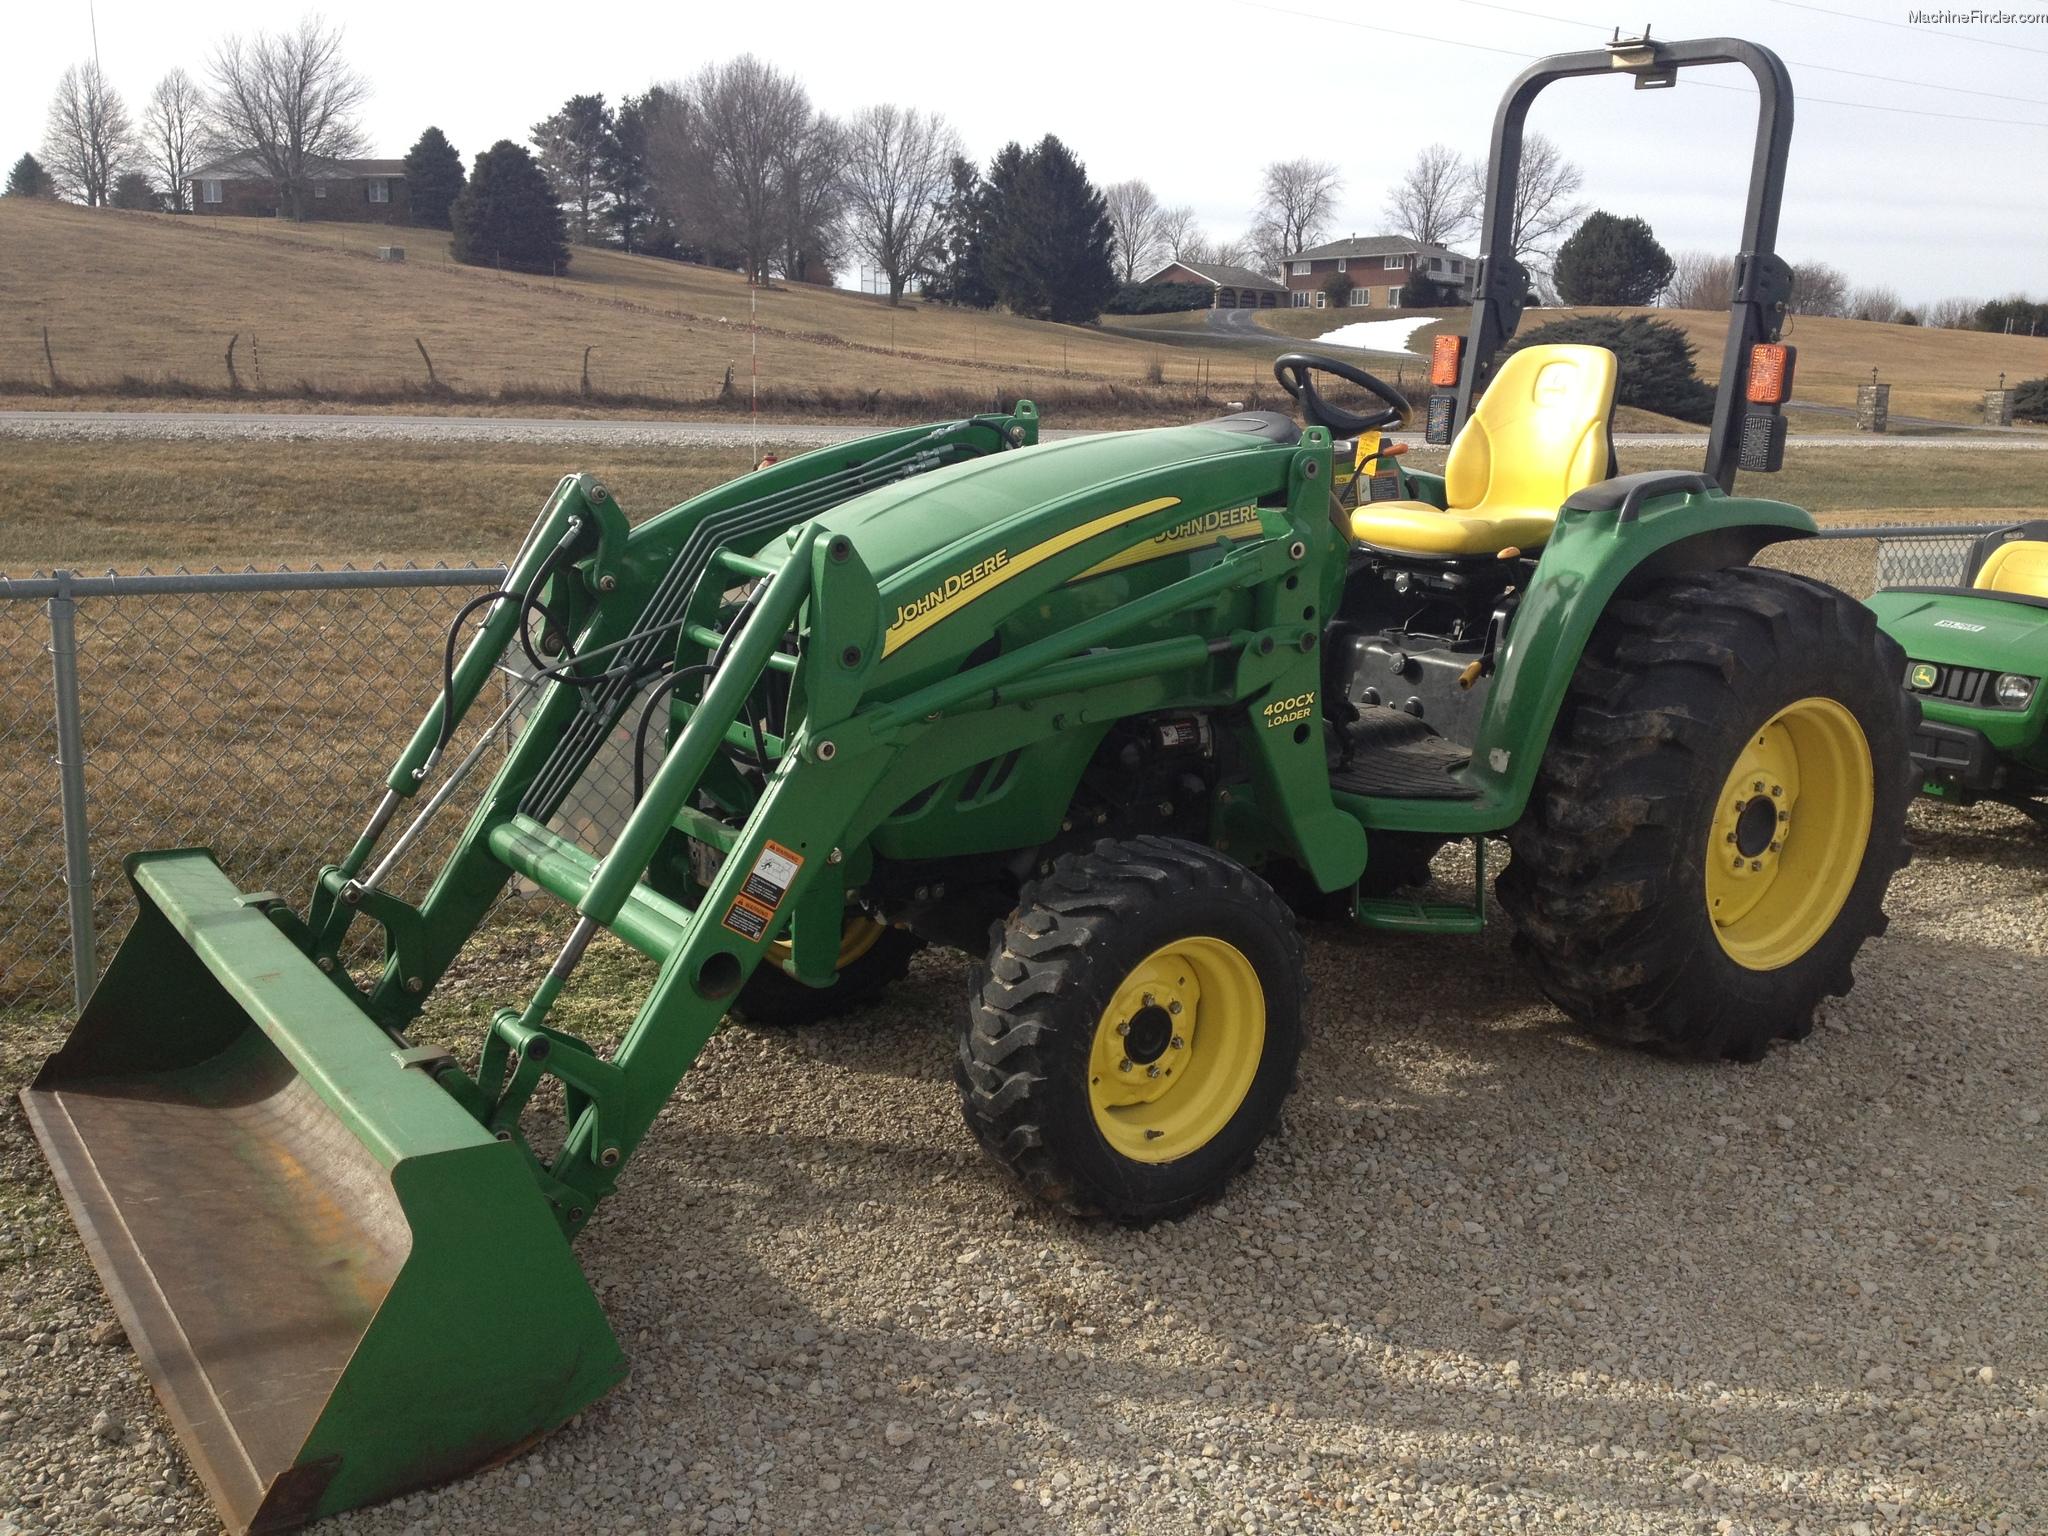 2010 John Deere 4320 Tractors - Compact (1-40hp.) - John ...